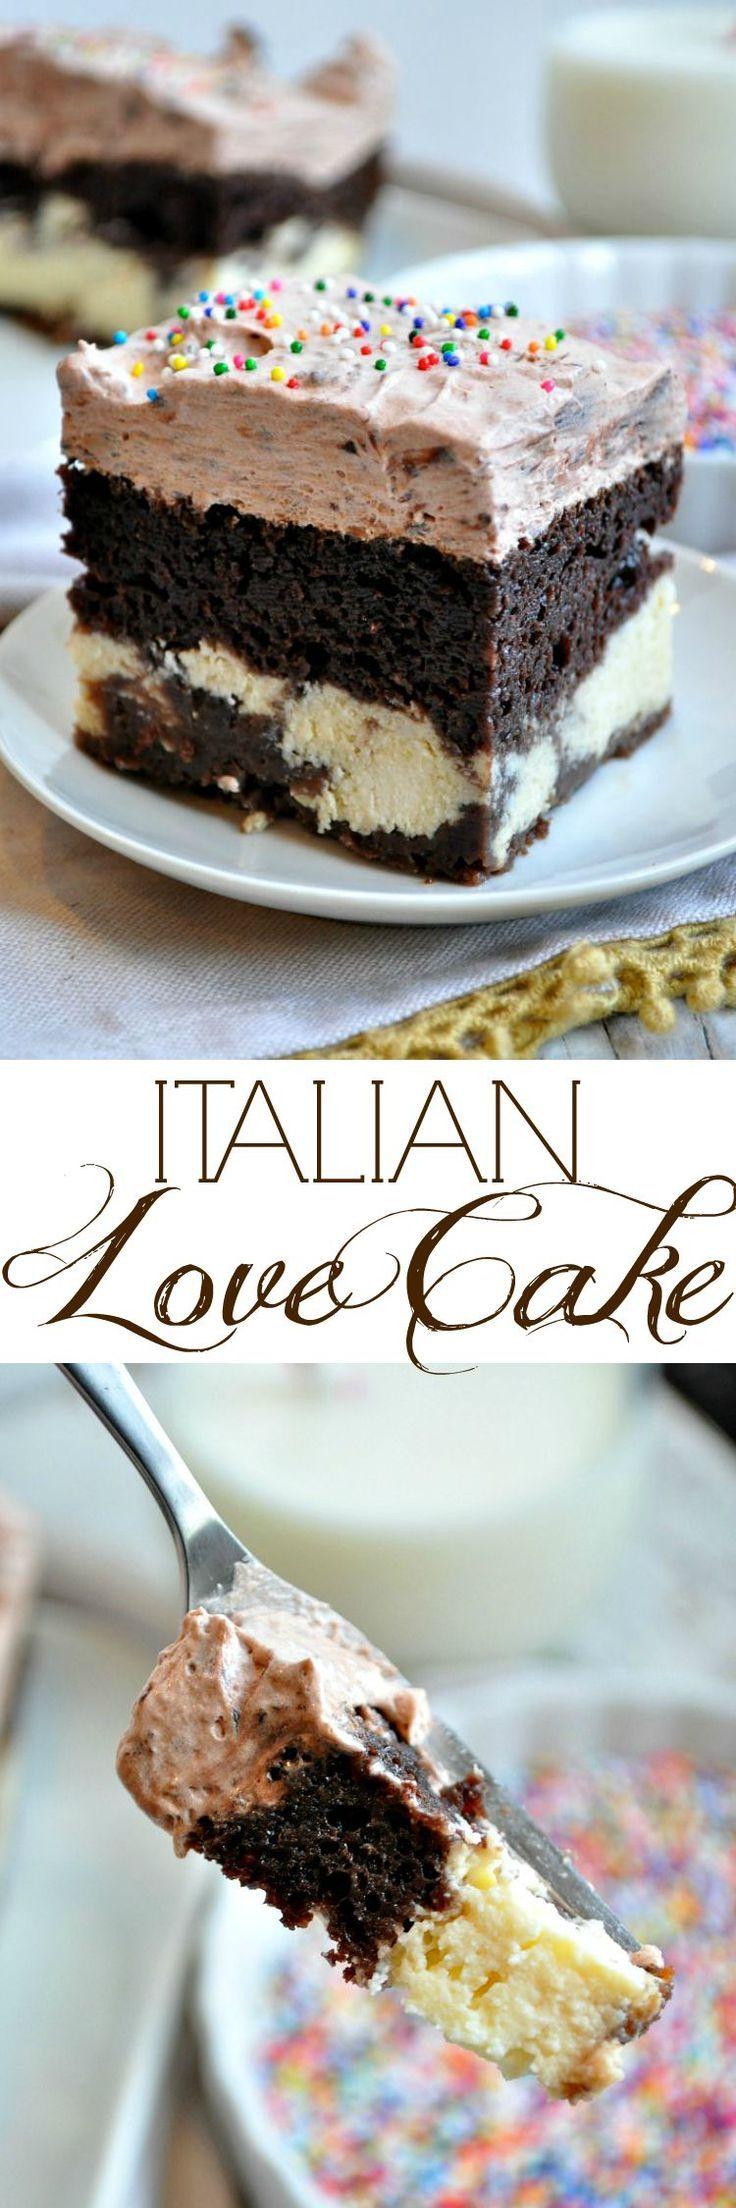 Italian Cream Cupcake Recipe Cake Mix